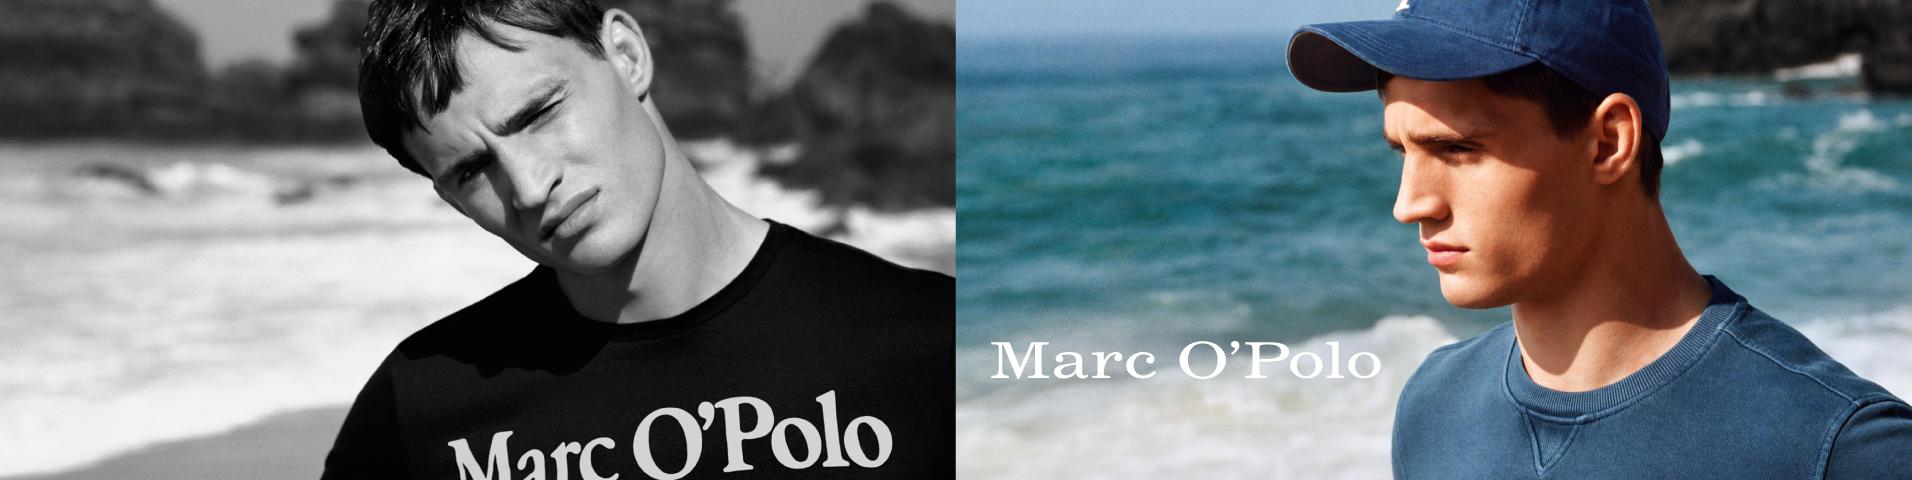 c8cc5483db05 Marc O Polo